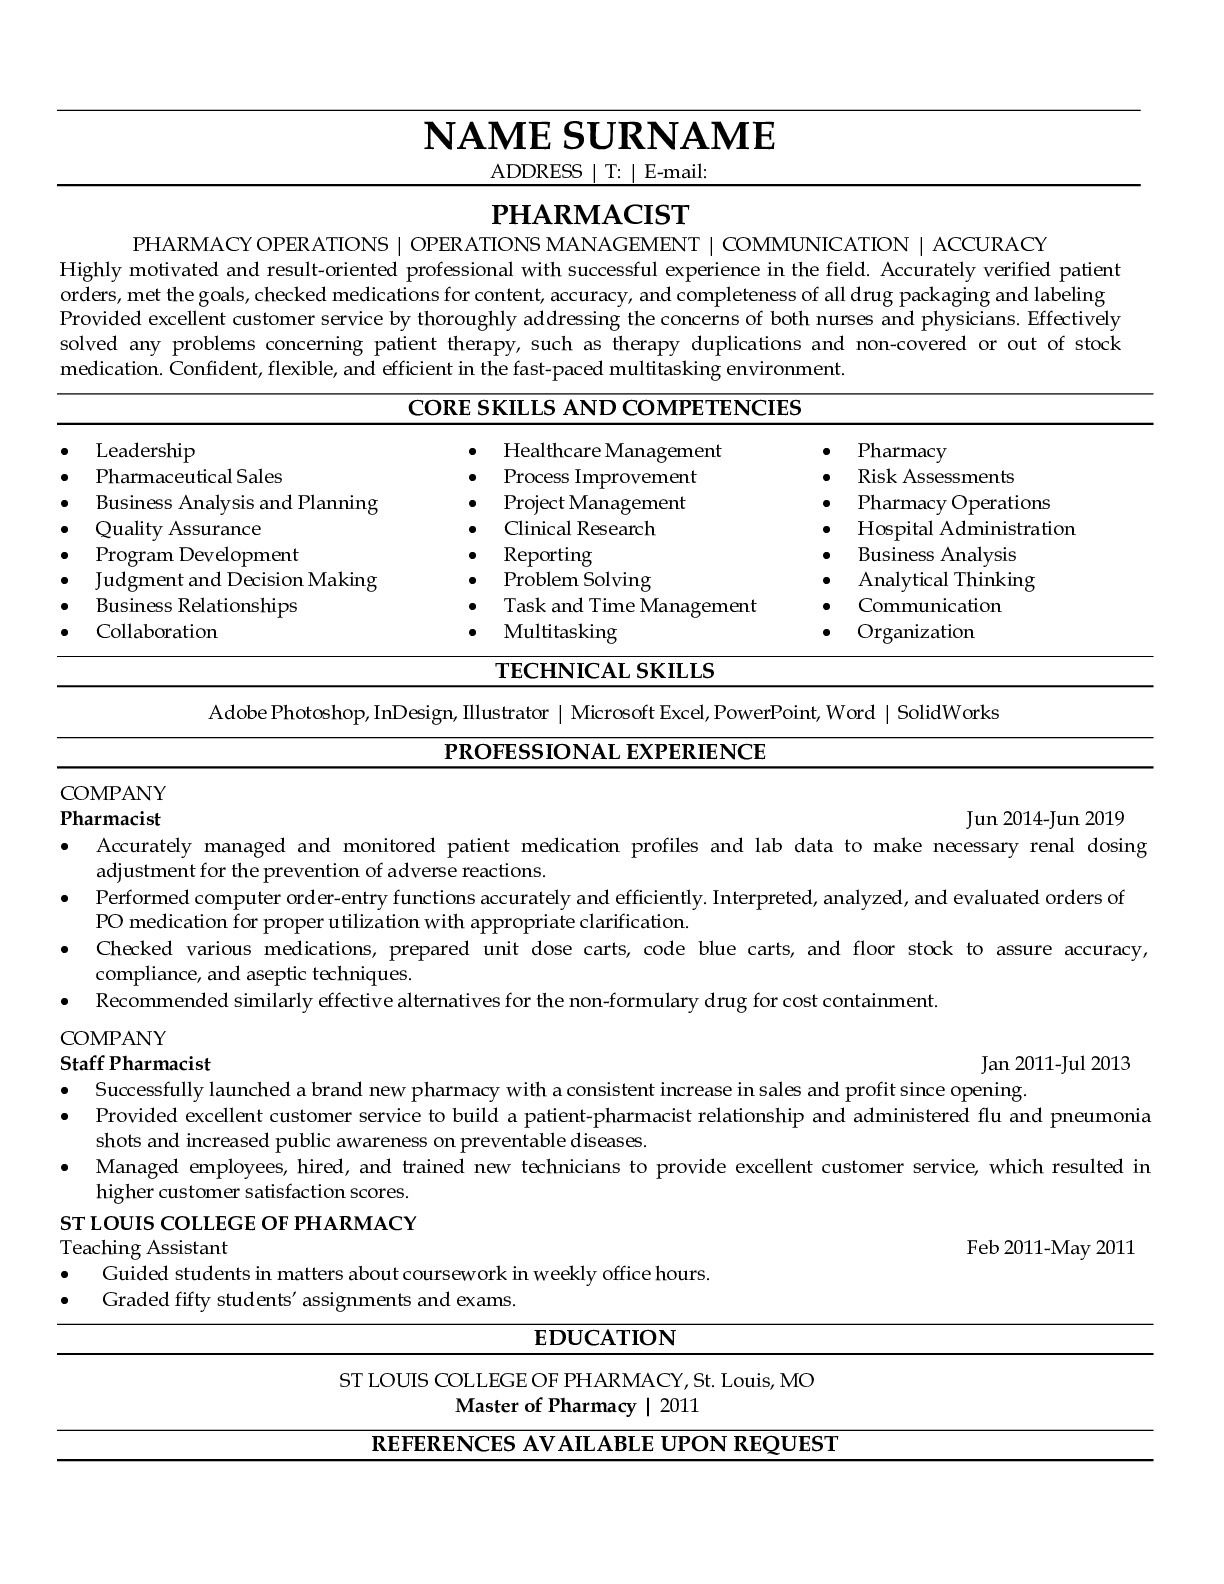 Resume Example for Pharmacist